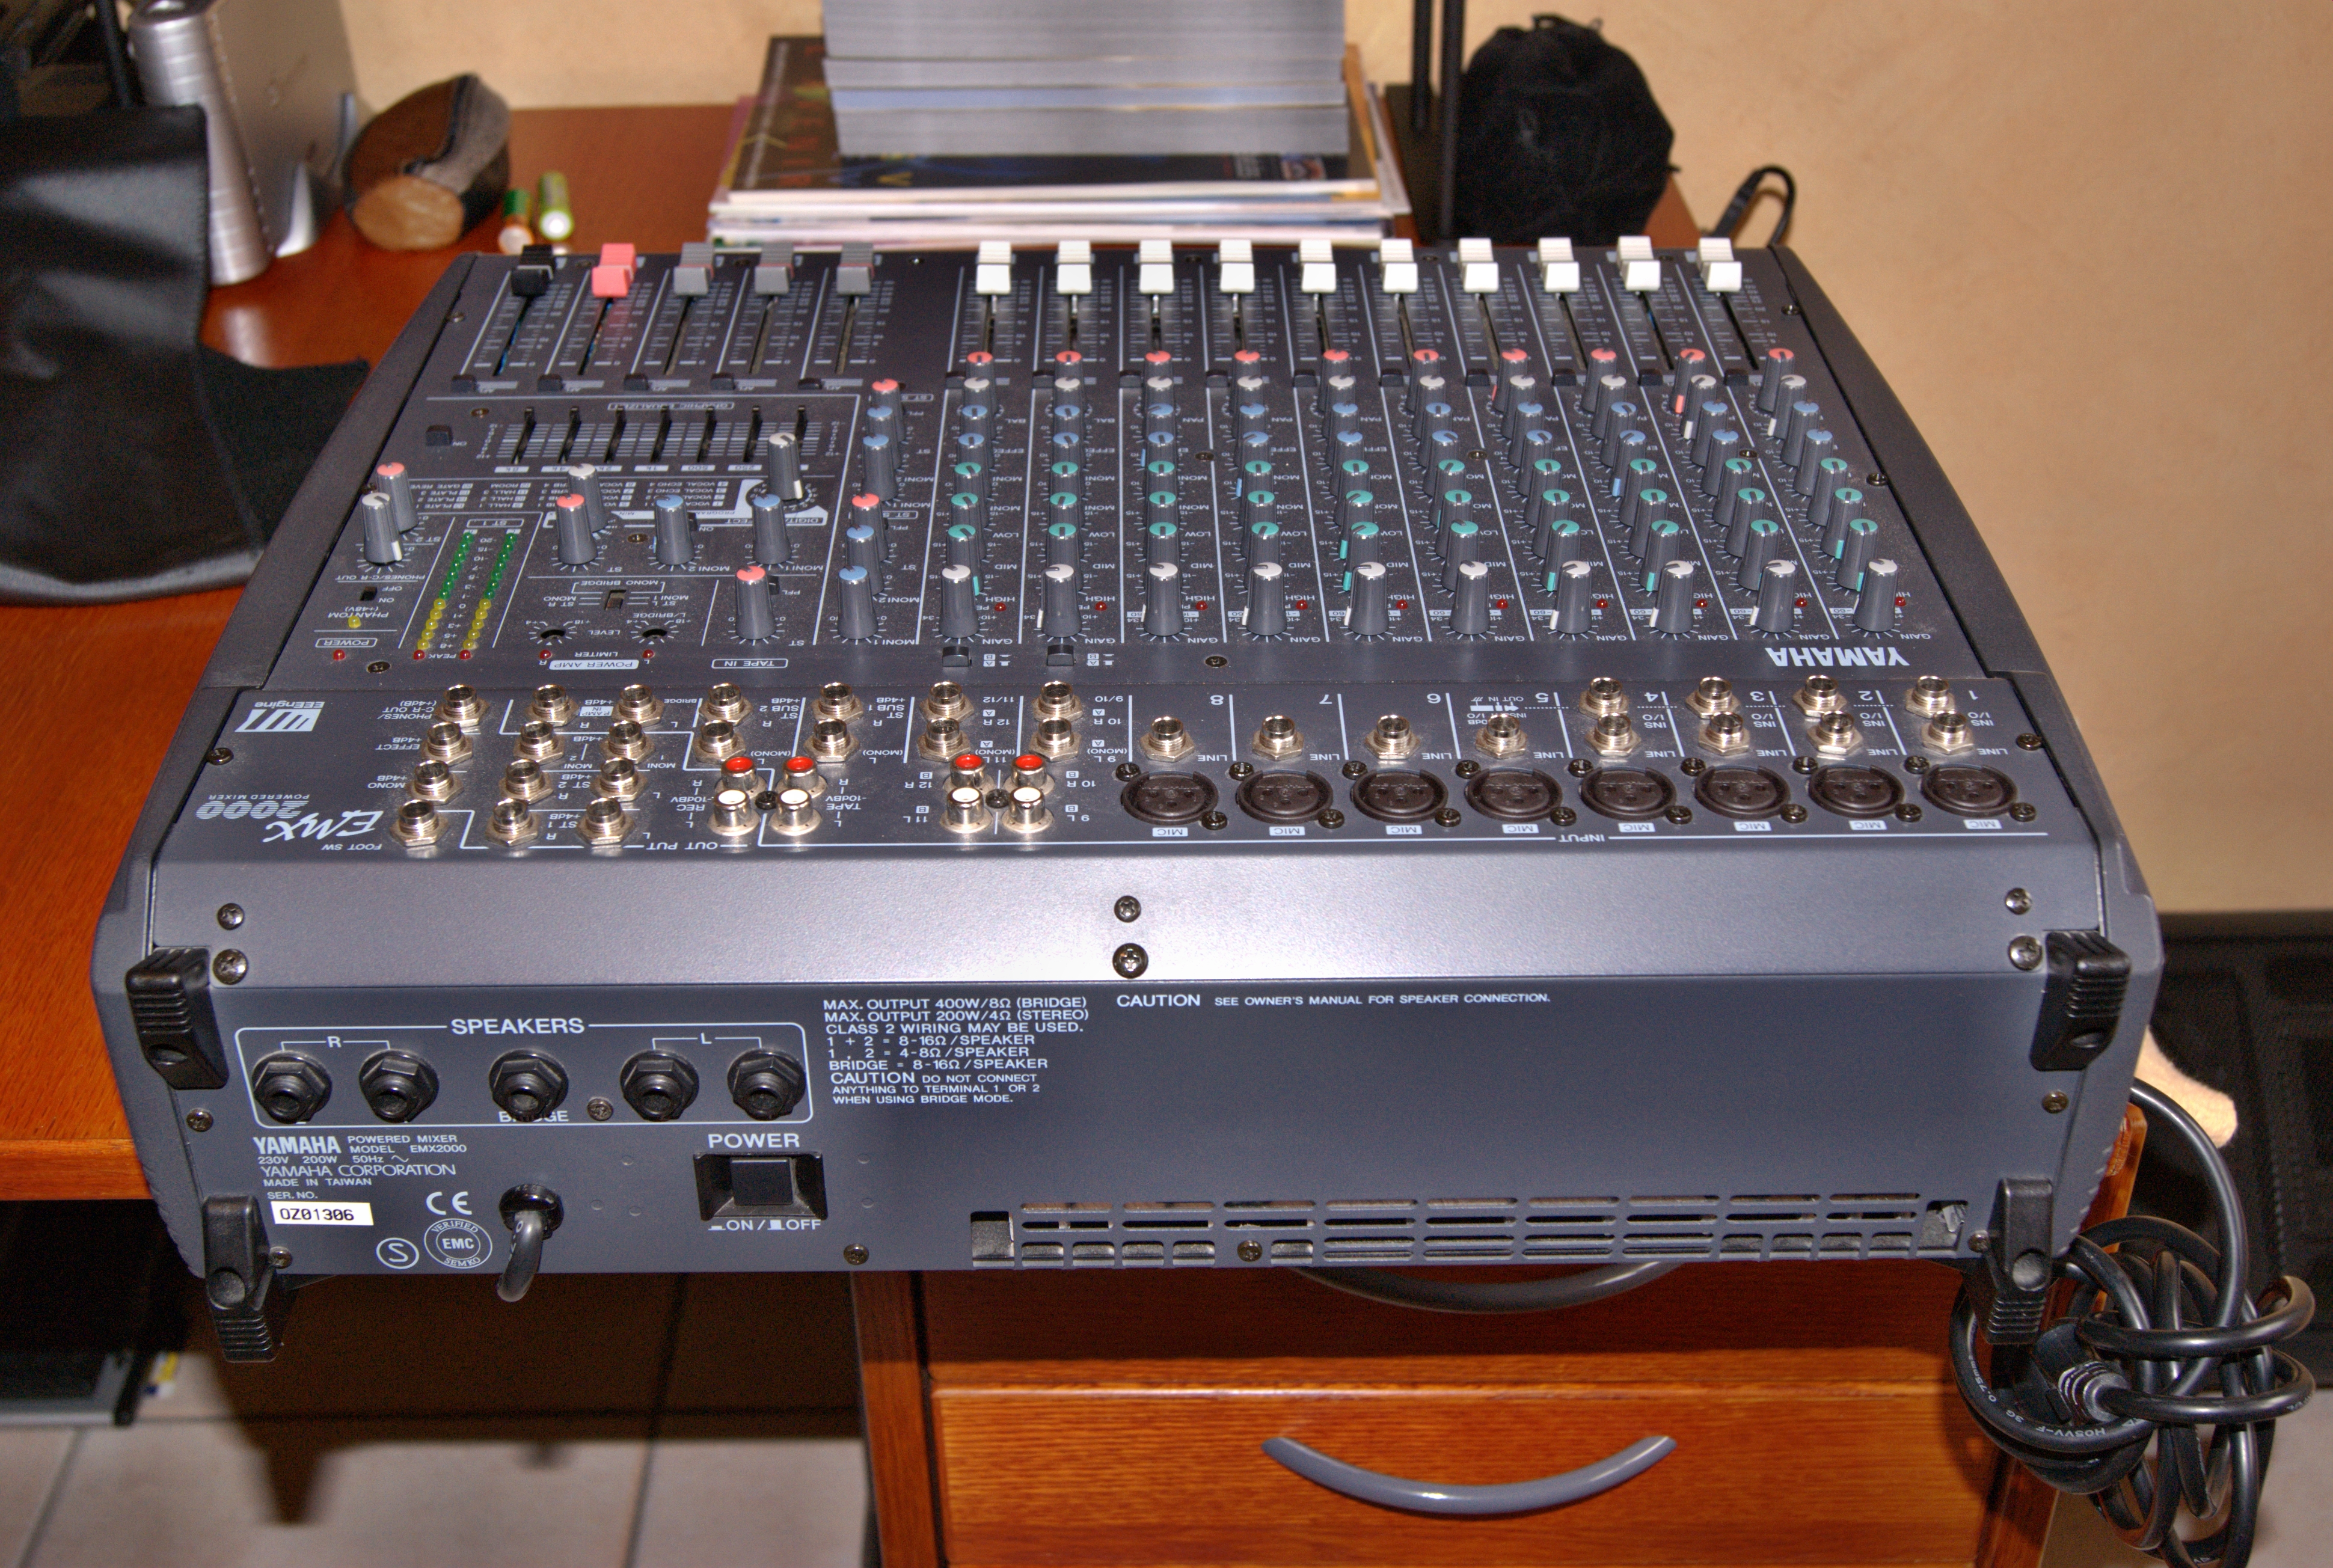 Photo yamaha emx2000 12 yamaha emx2000 12 28621 284480 audiofanzine - Table de mixage amplifiee yamaha ...